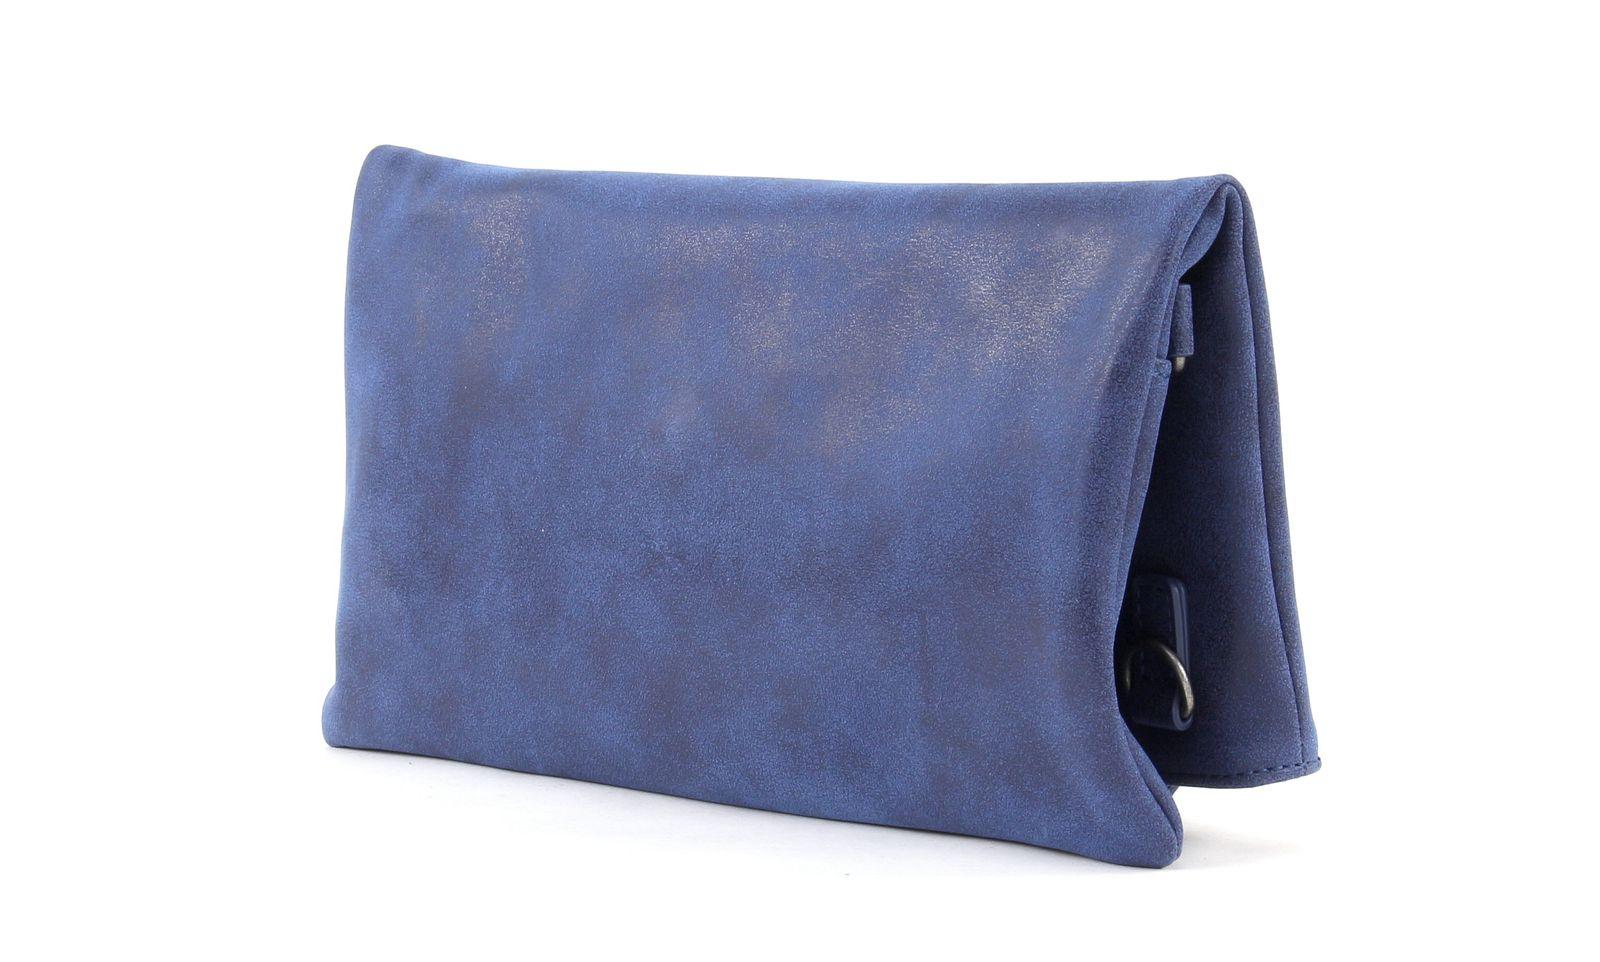 fritzi aus preu en ronja classic vintage tasche umh ngetasche clutch blau damen ebay. Black Bedroom Furniture Sets. Home Design Ideas